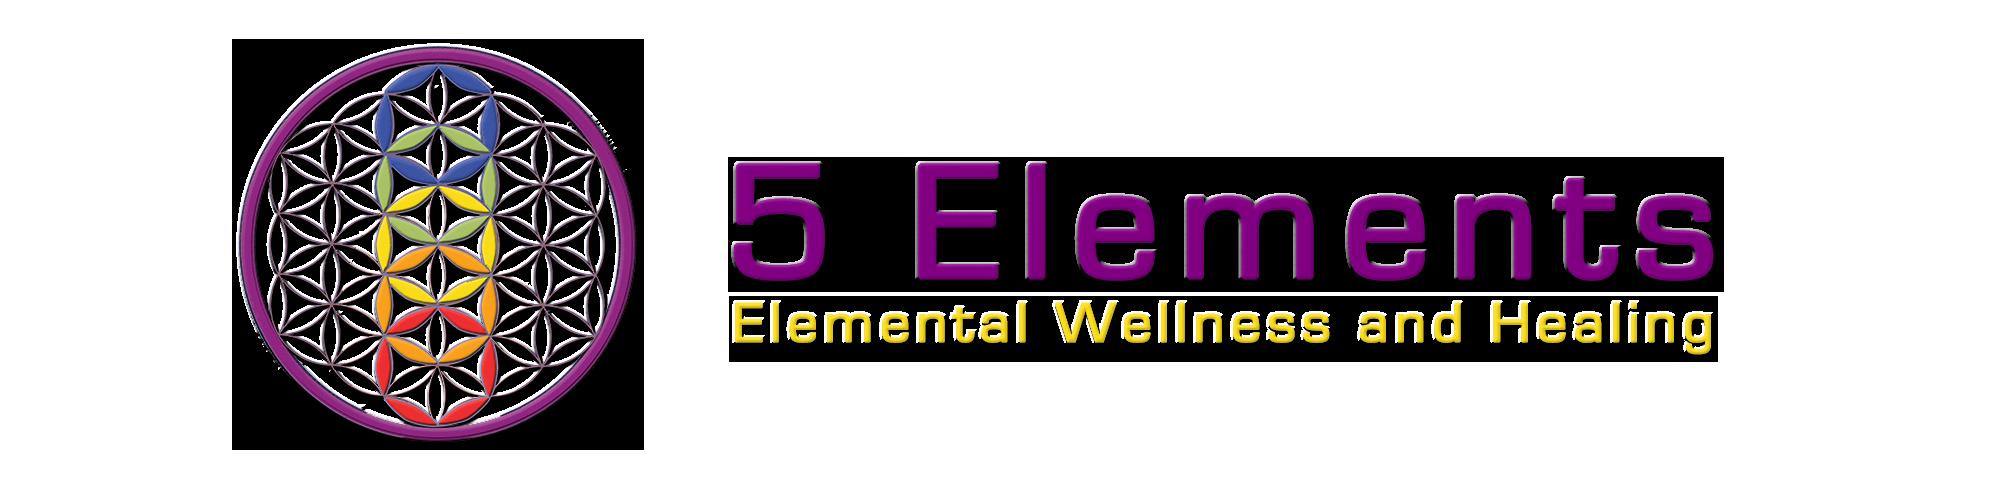 Massage – 5 Elements